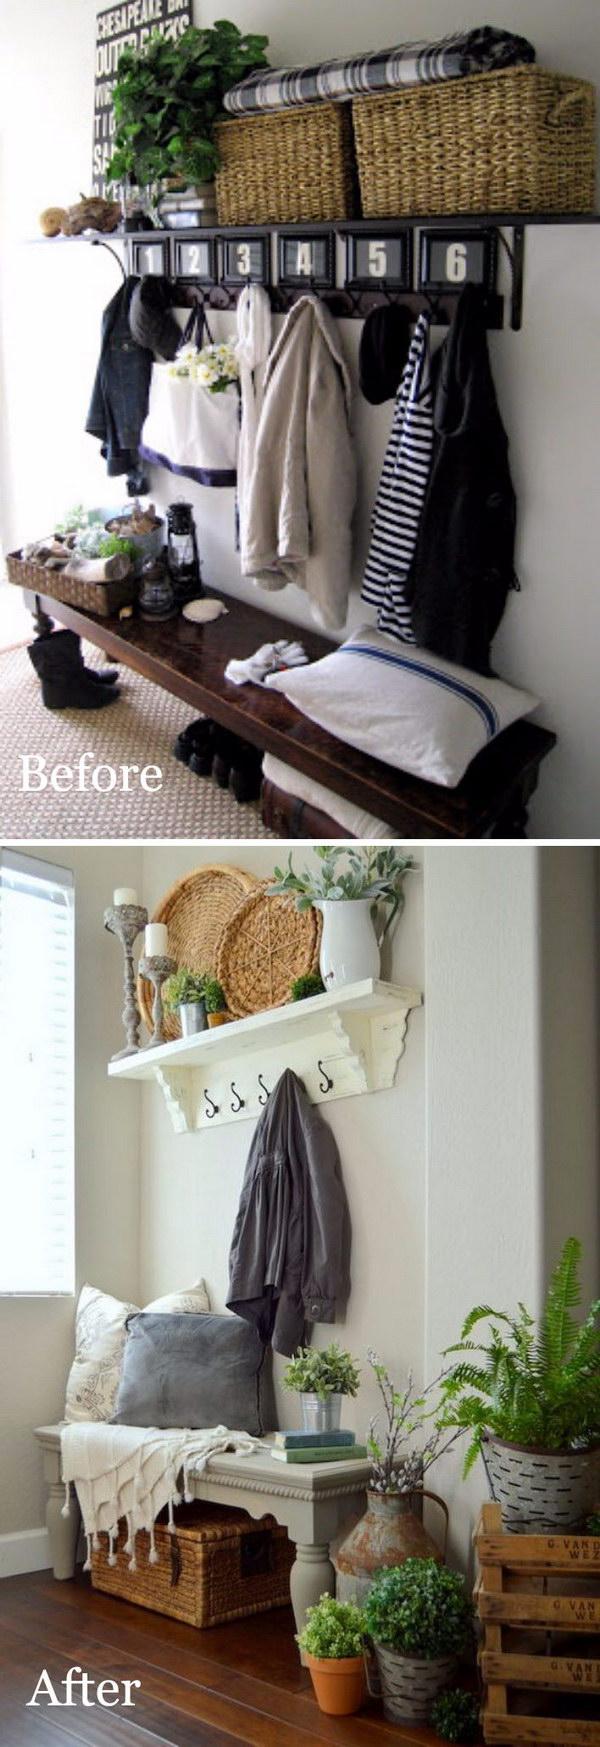 20 entryway makeover diy ideas tutorials - 30+ DIY Ideas to Give a Makeover to a Your Entryway